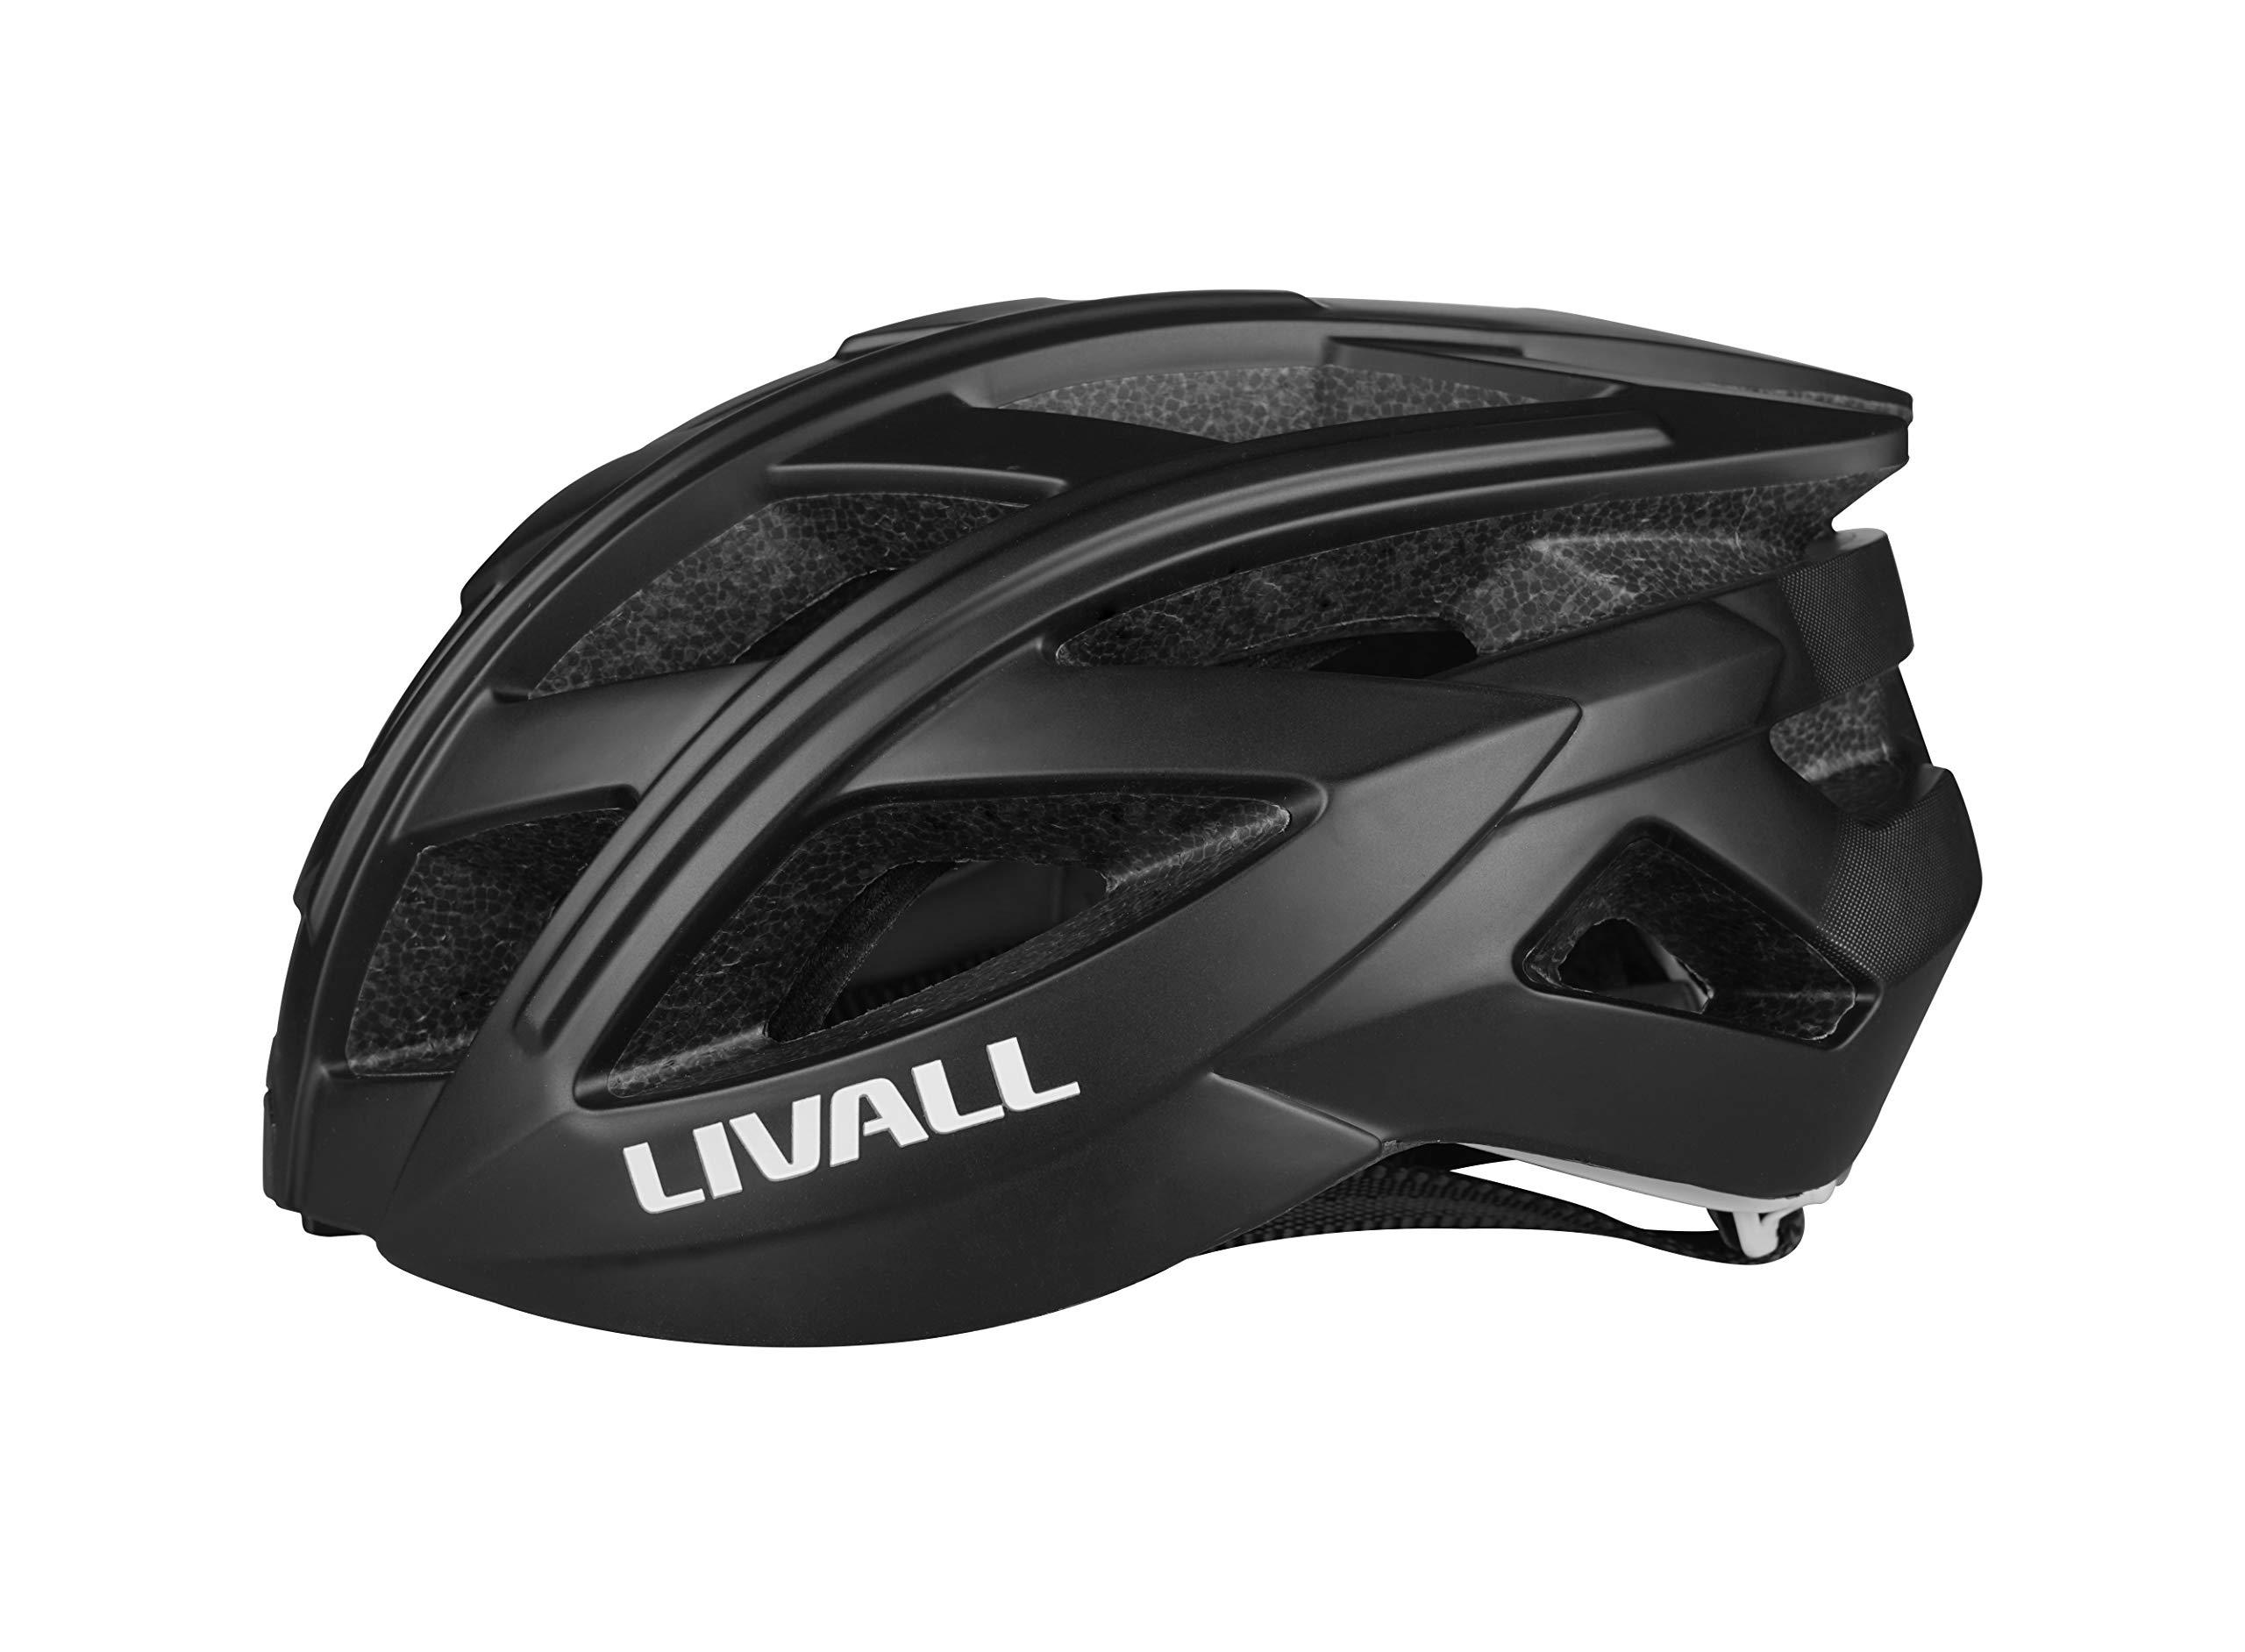 Polar Black NEW Livall Road Bike Smart Bluetooth Cycling Light Helmet BH60SE